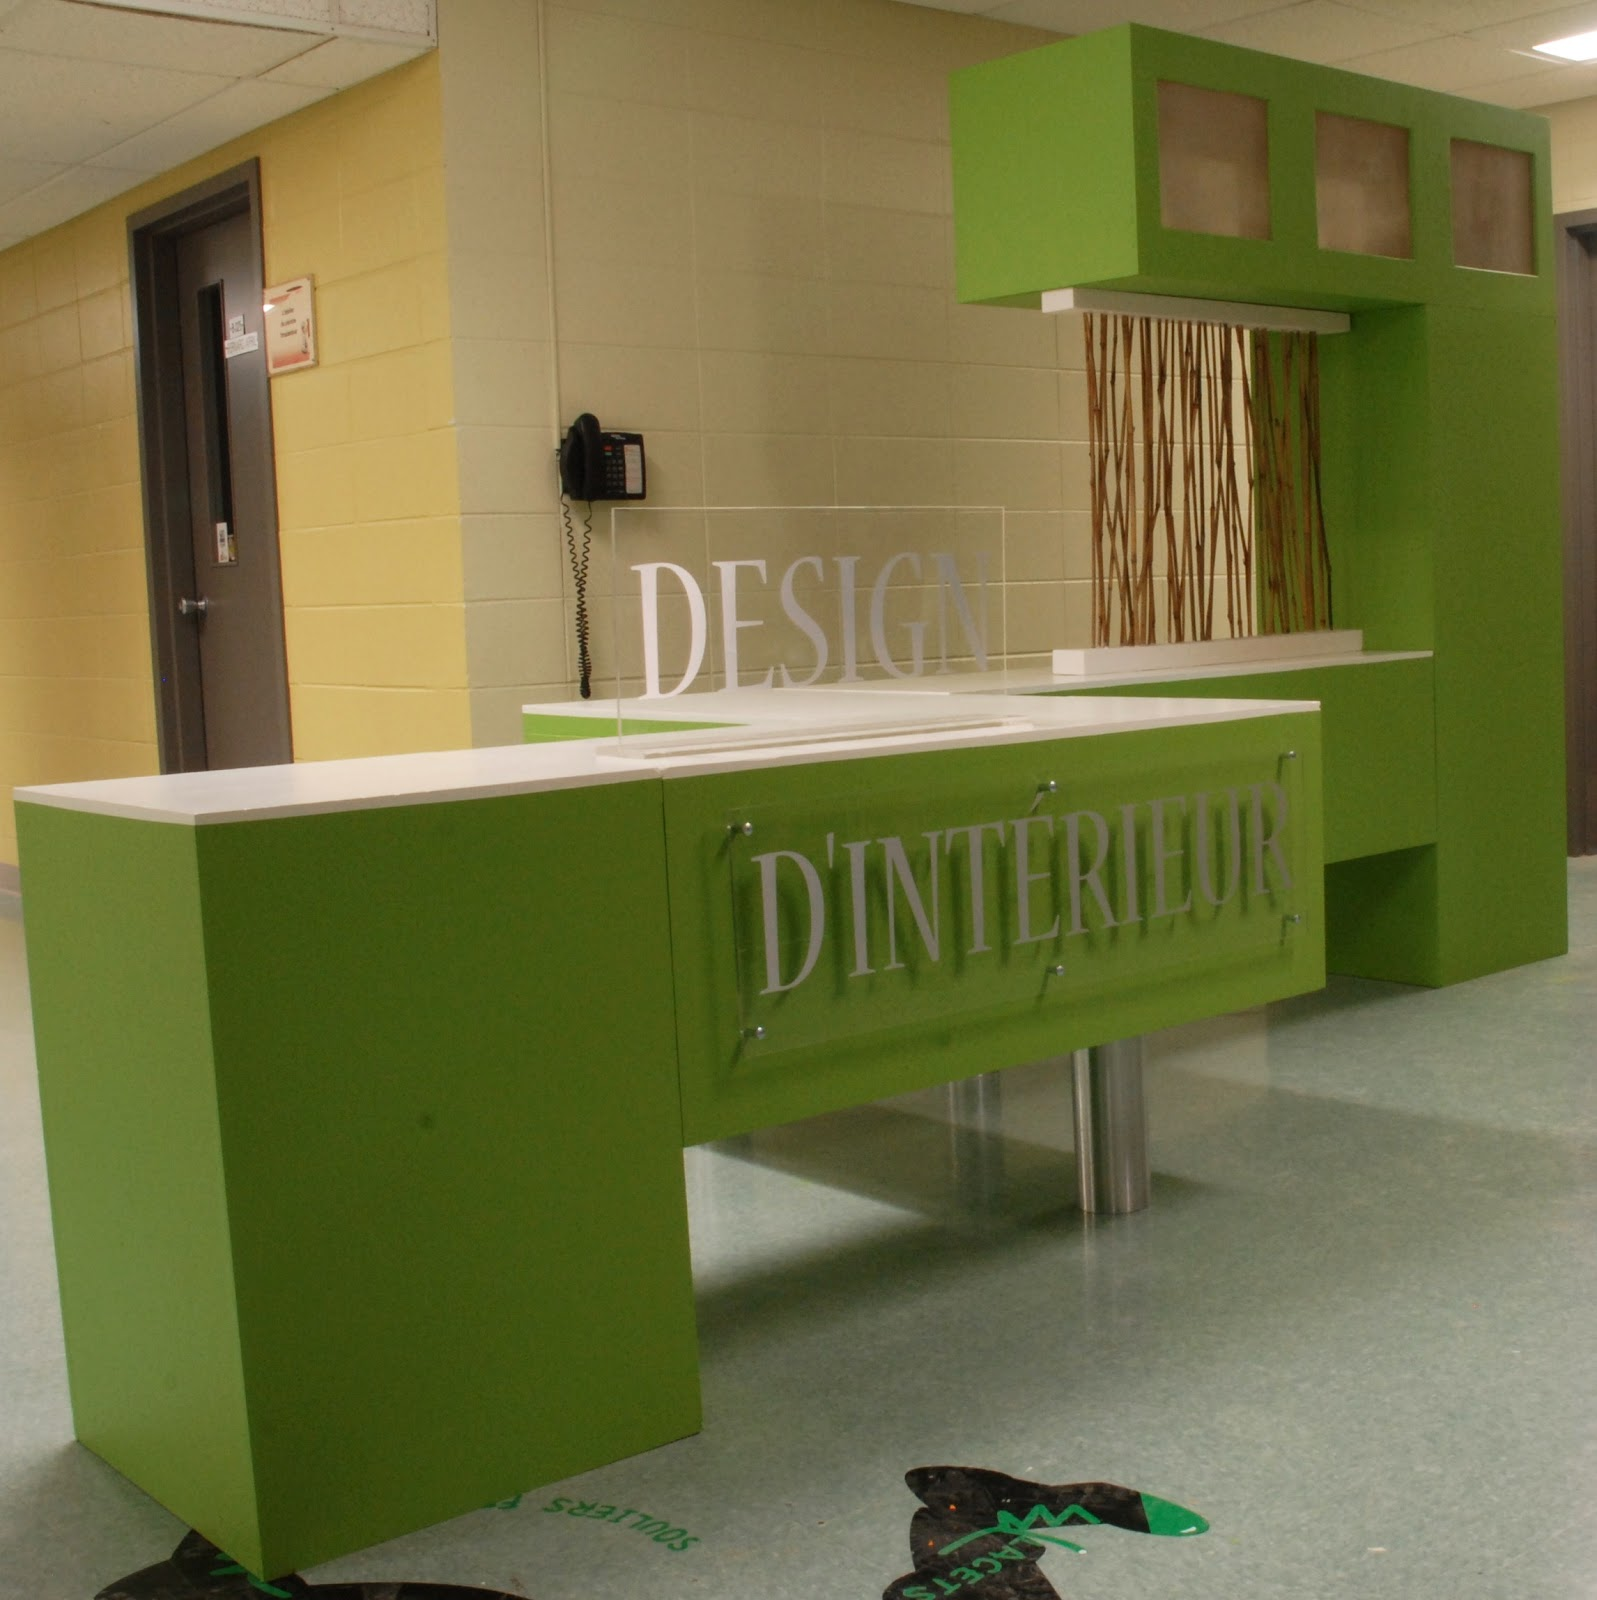 Kiosque d 39 information design int rieur vickie lebrun for Design d interieur cegep garneau